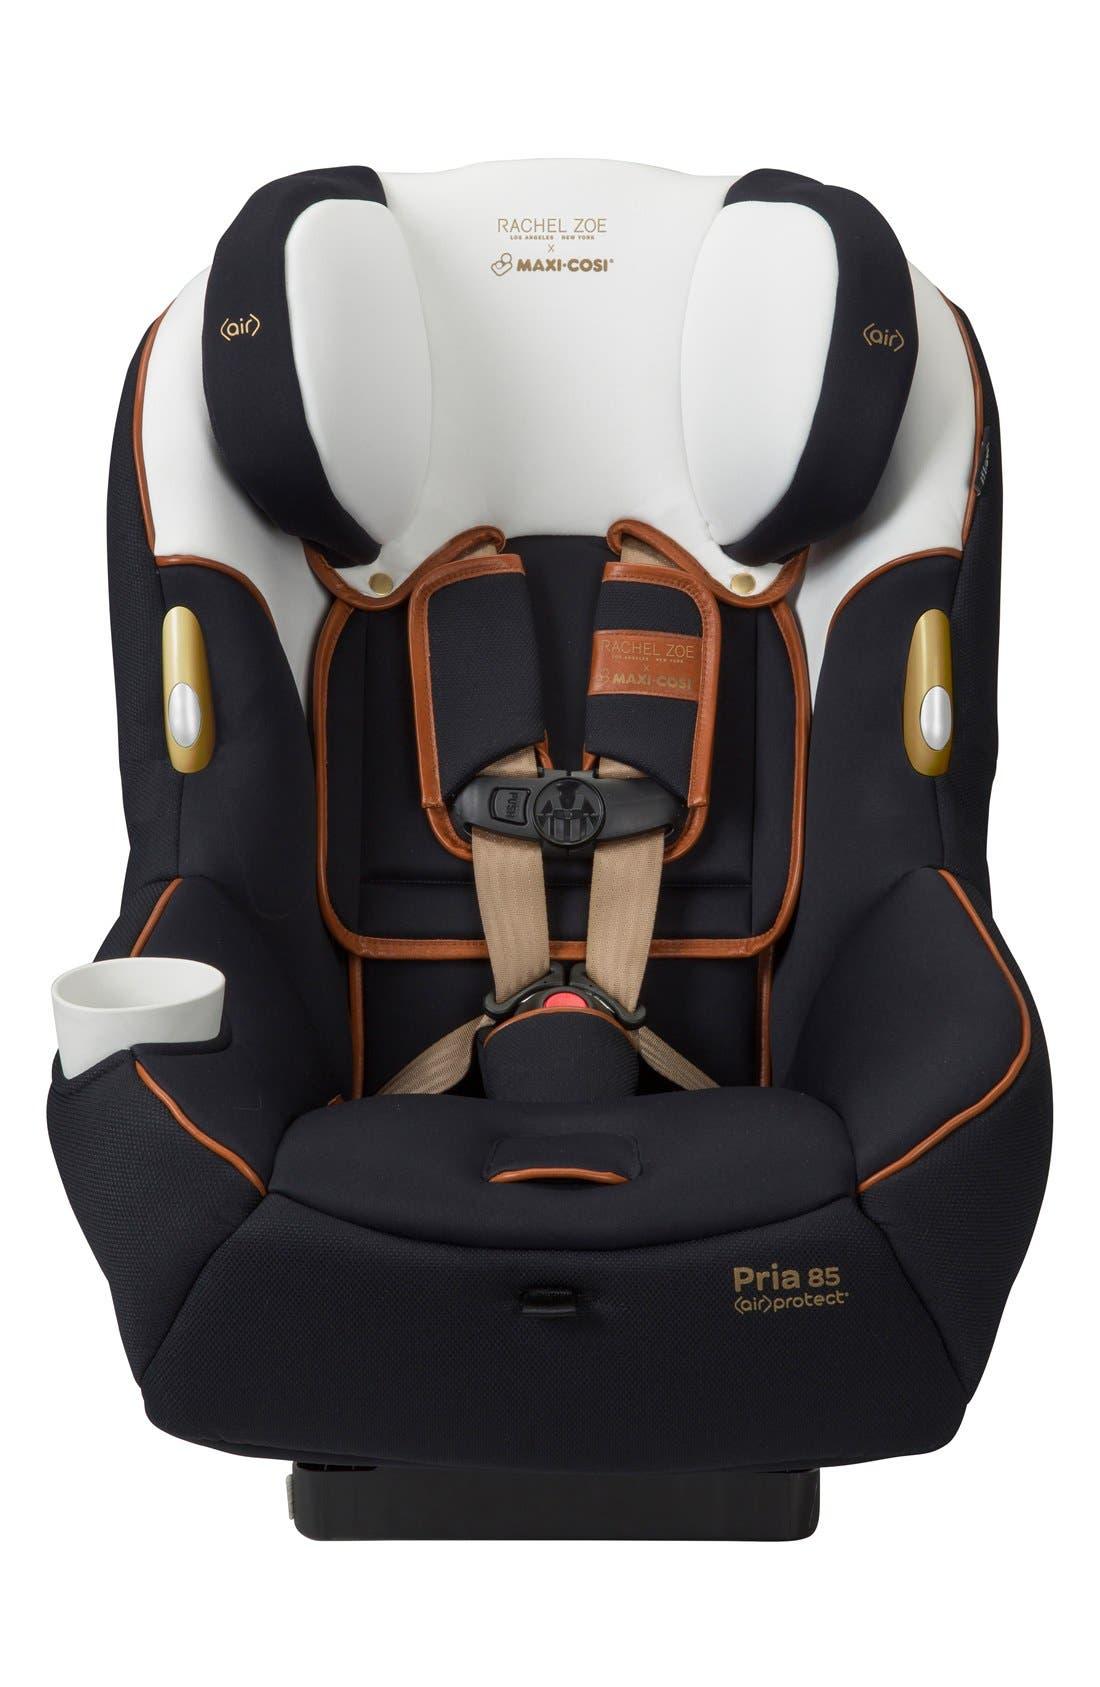 x Rachel Zoe Pria<sup>™</sup> 85 - Special Edition Car Seat,                         Main,                         color, Black/ White